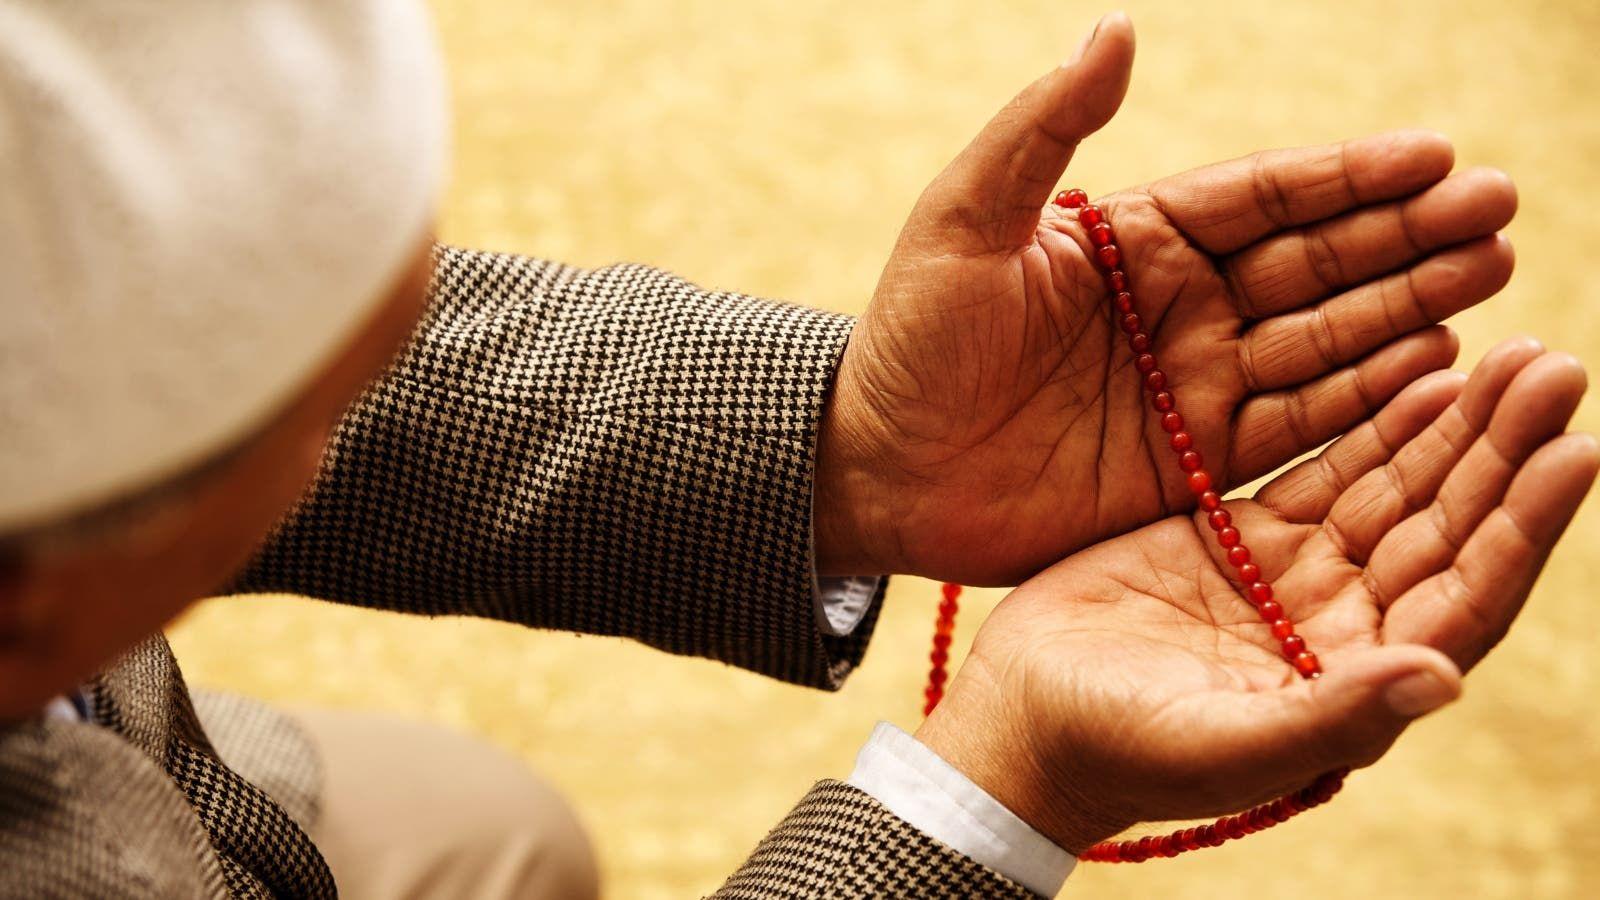 دعاء بداية شهر جديد Prayers Muslim Prayer Peace Be Upon Him